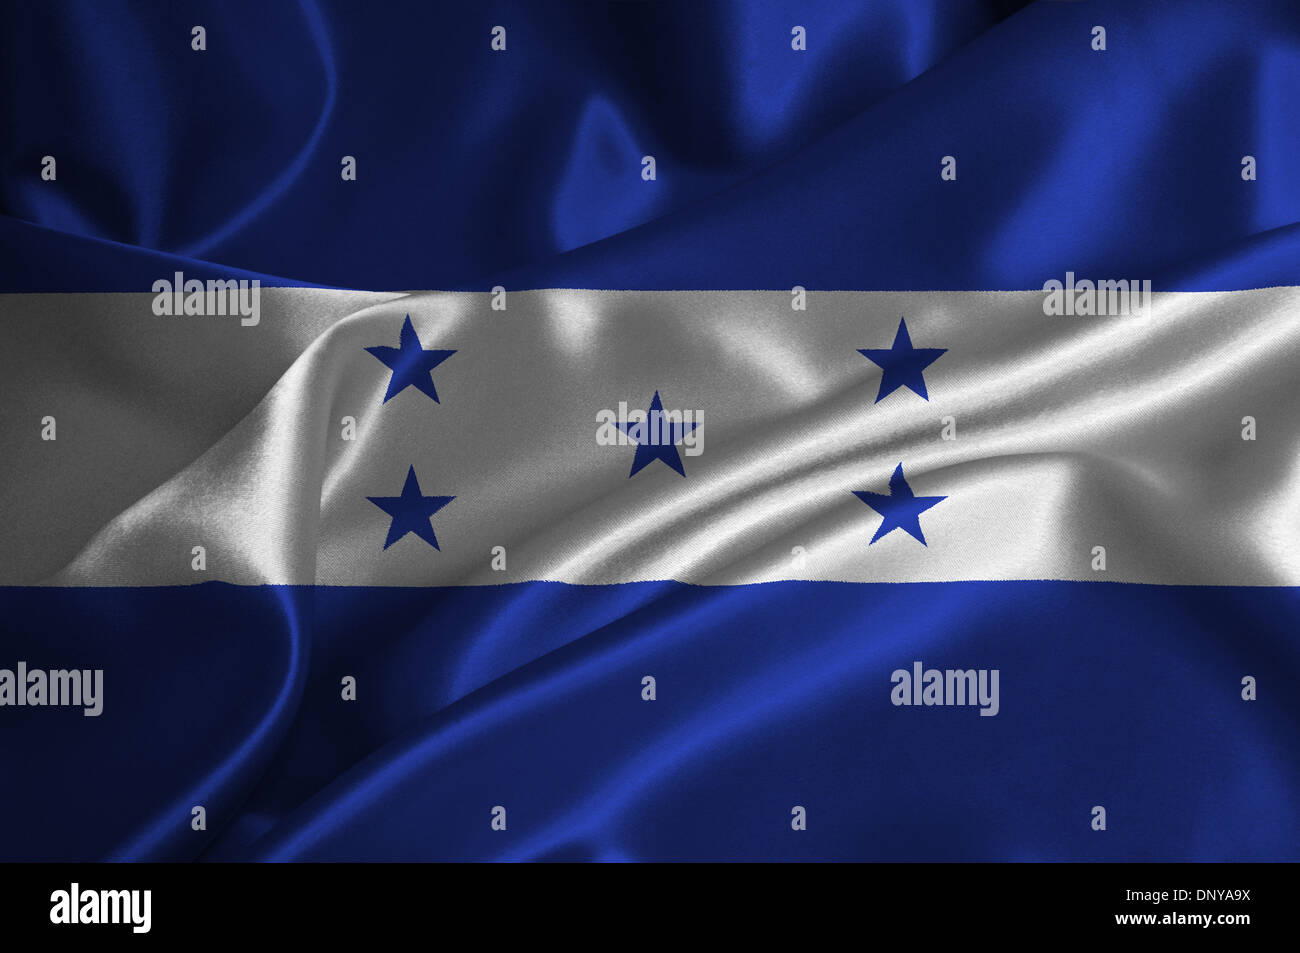 Honduras flag on satin texture. Stock Photo